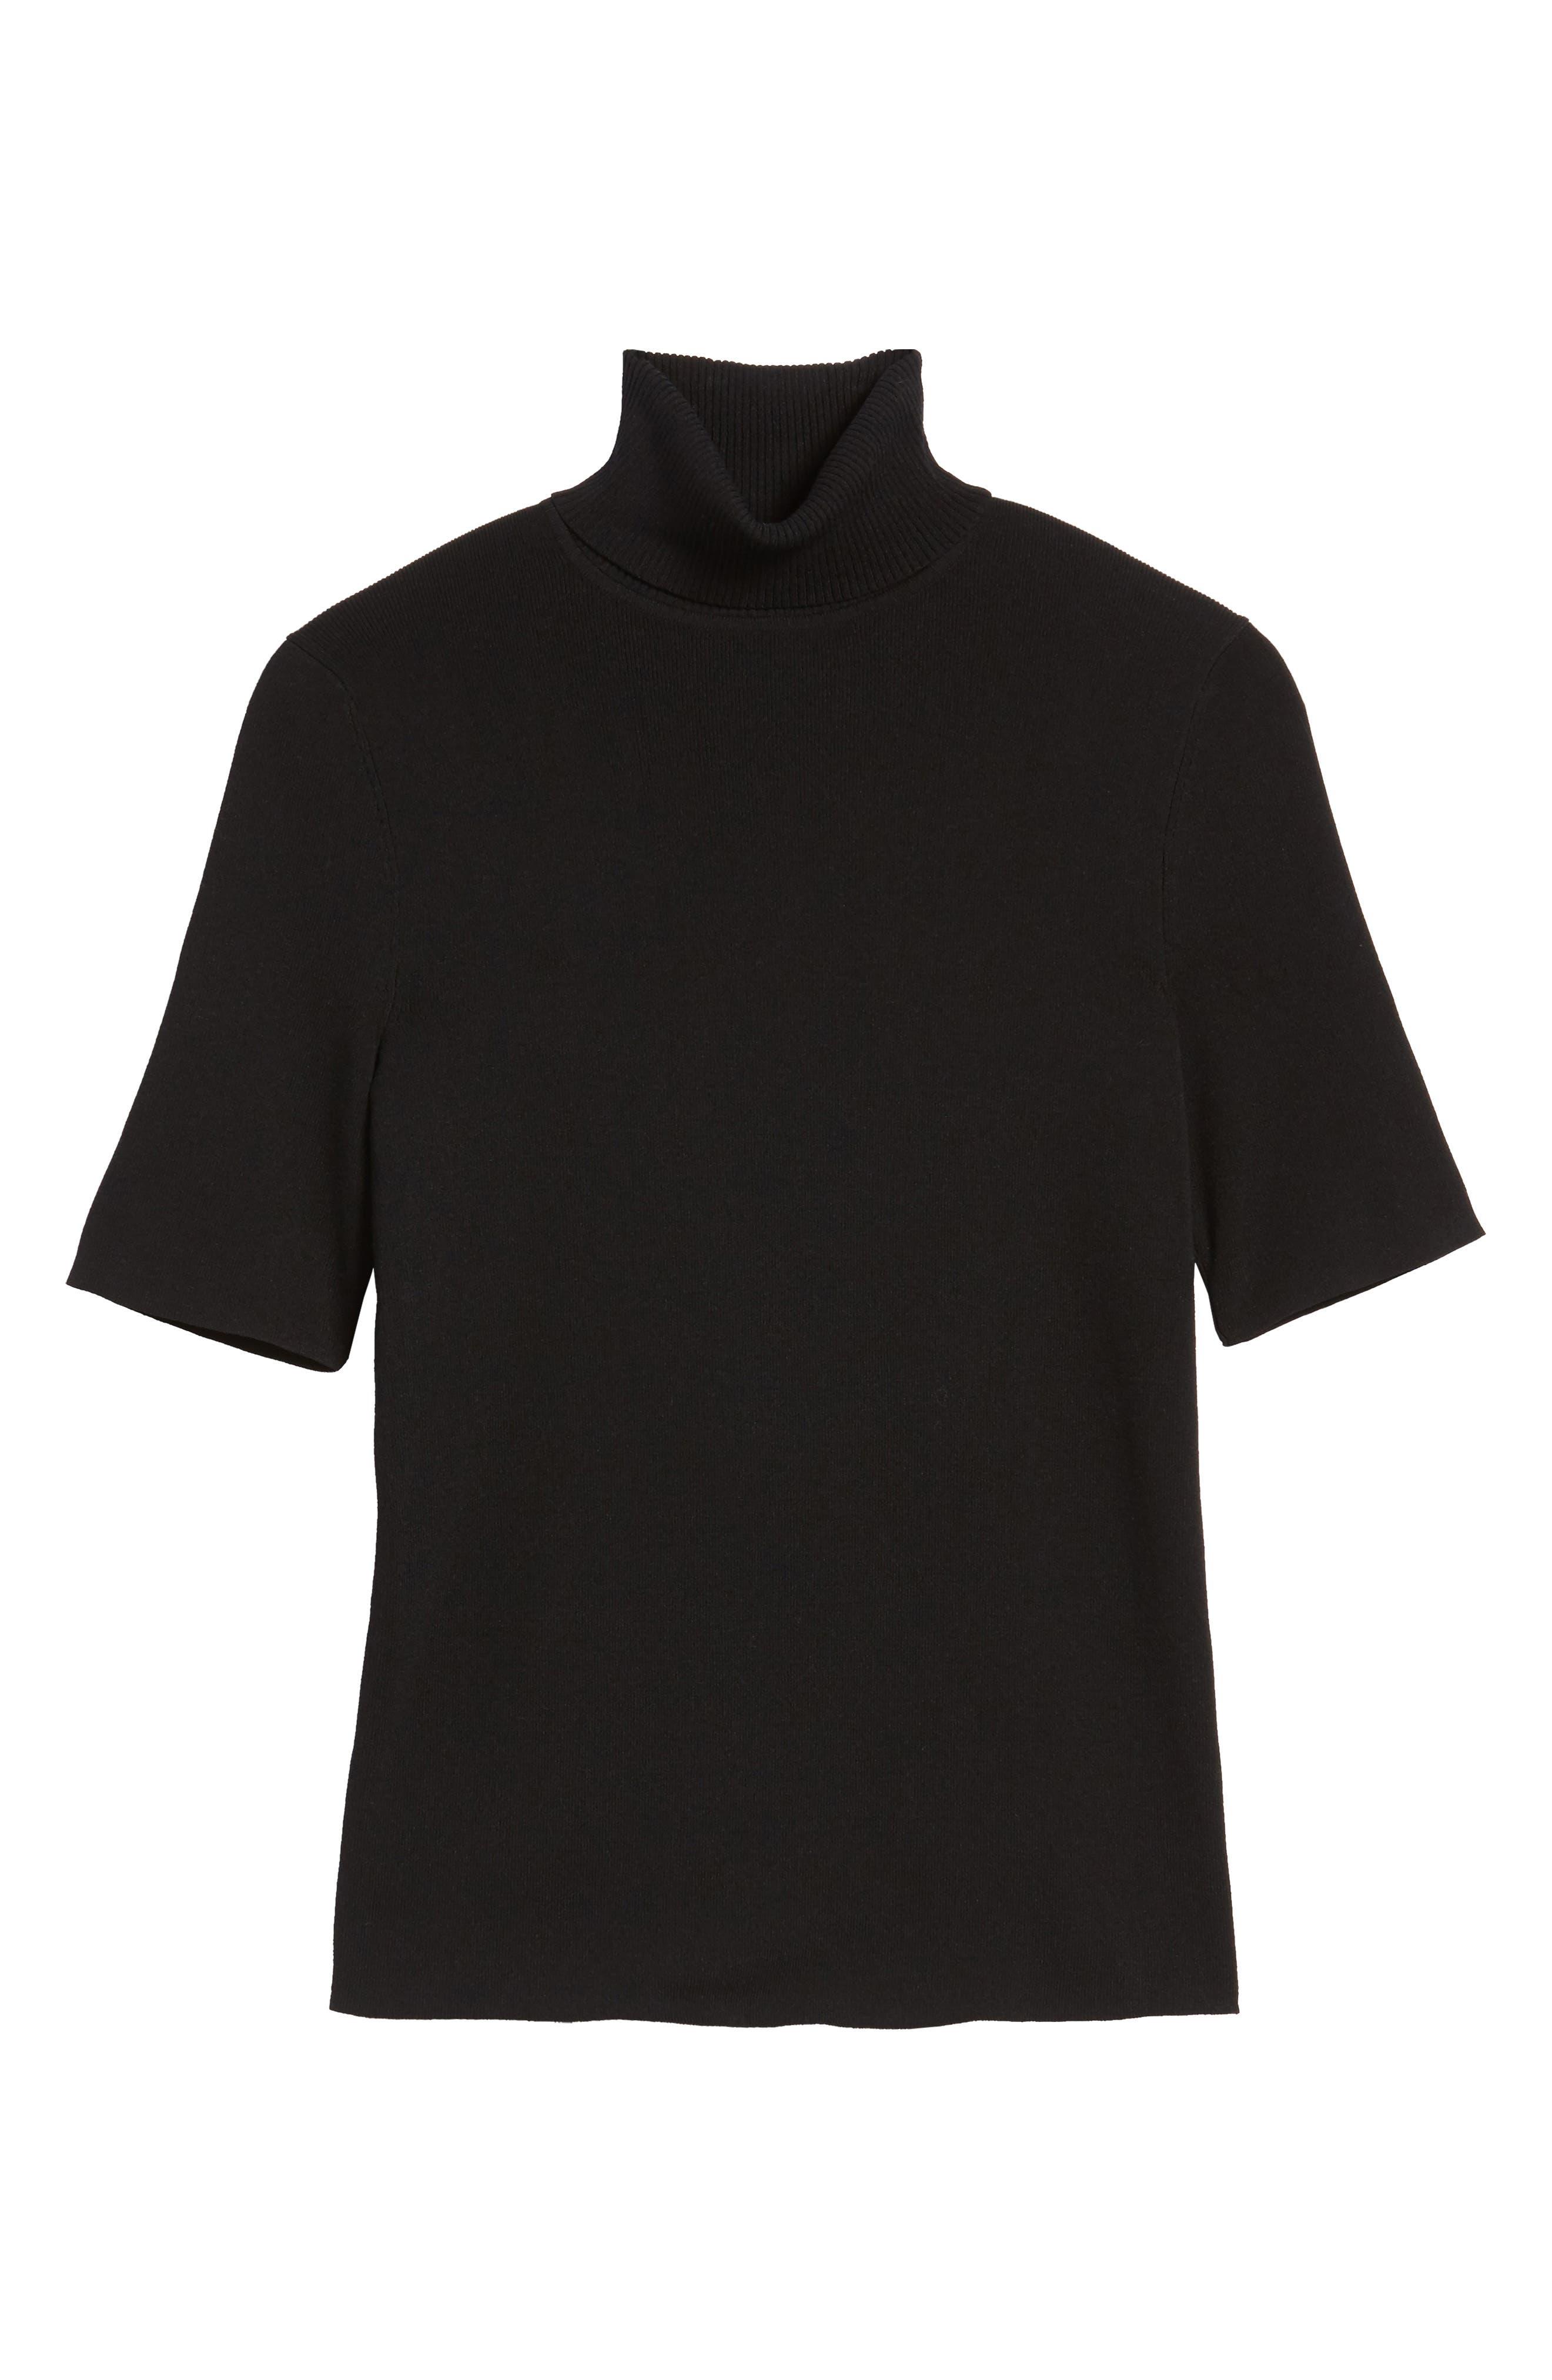 Turtleneck Sweater,                             Alternate thumbnail 6, color,                             Black